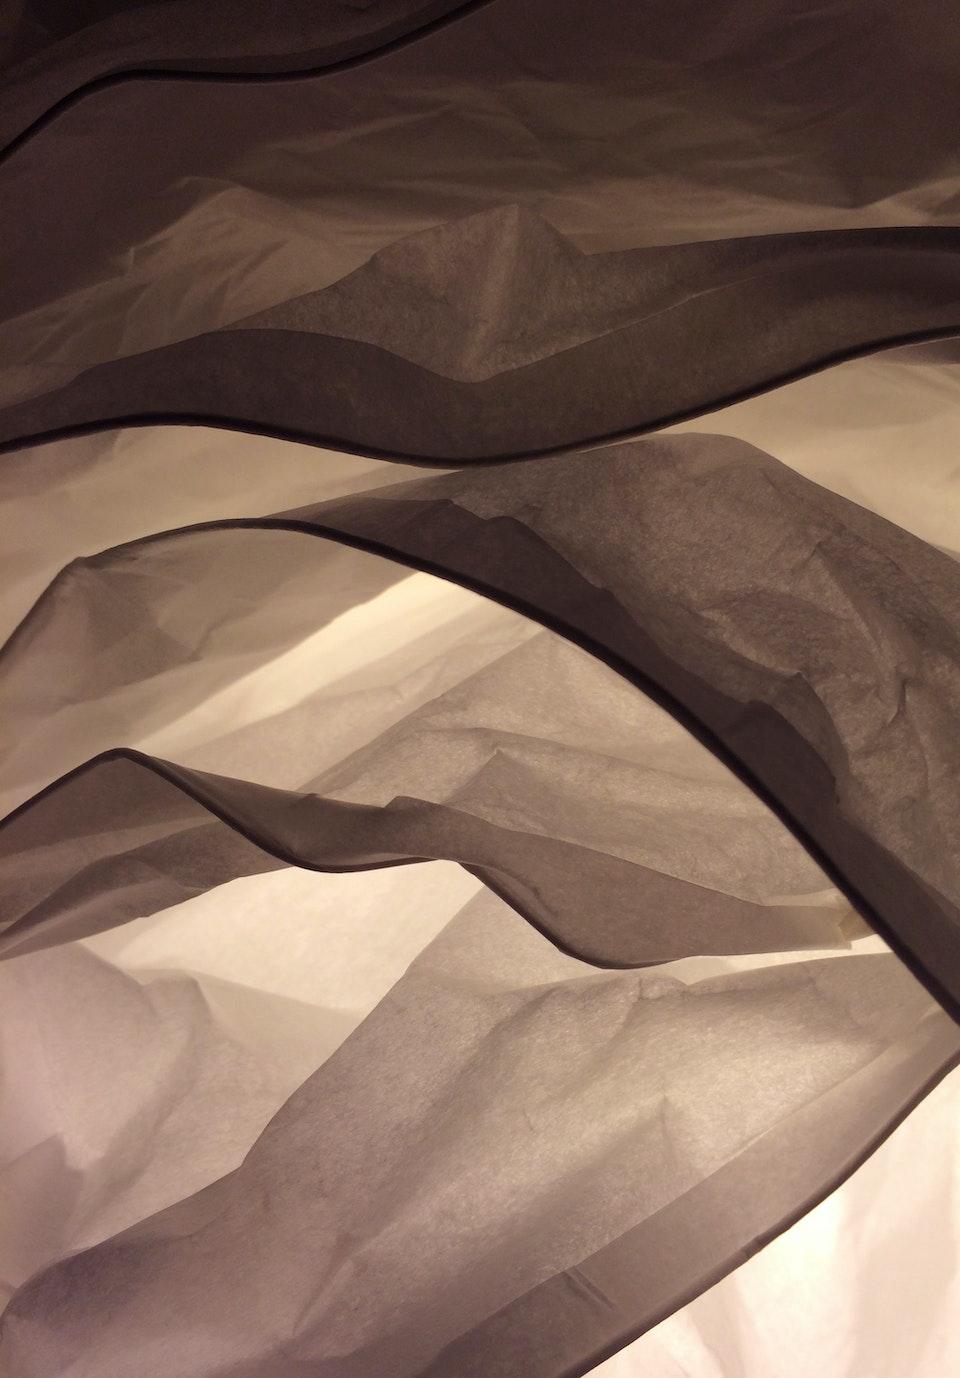 Waves + Ripples